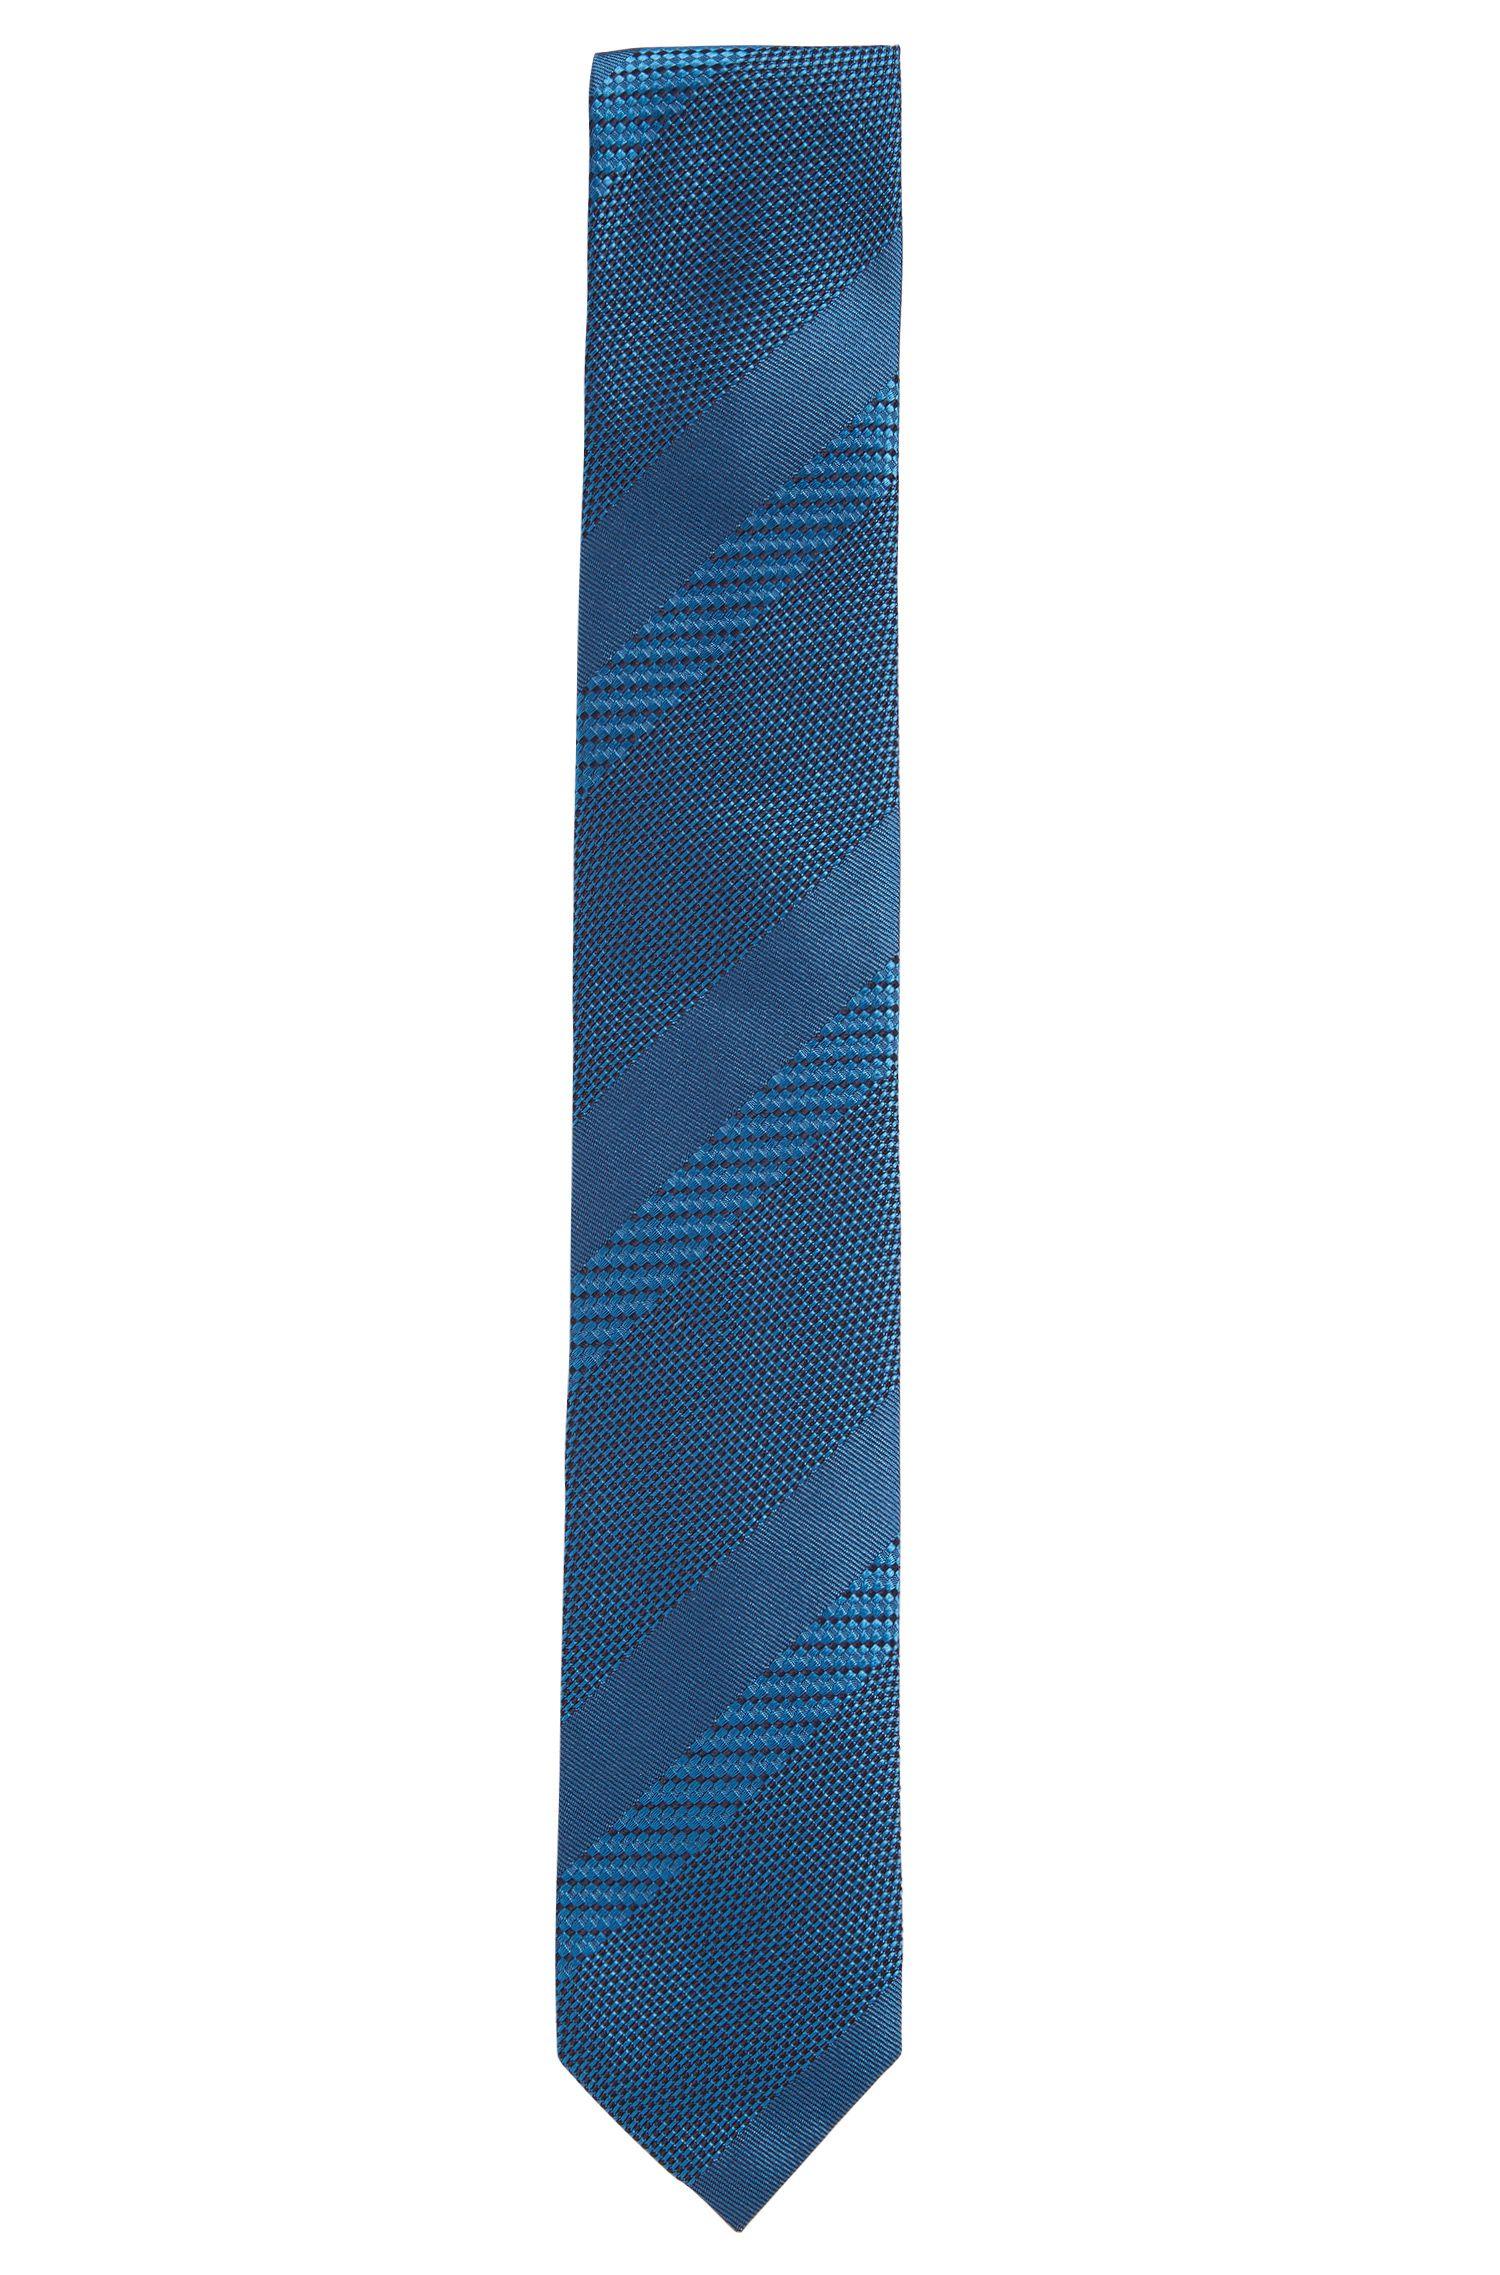 Silk jacquard tie with textured stripes